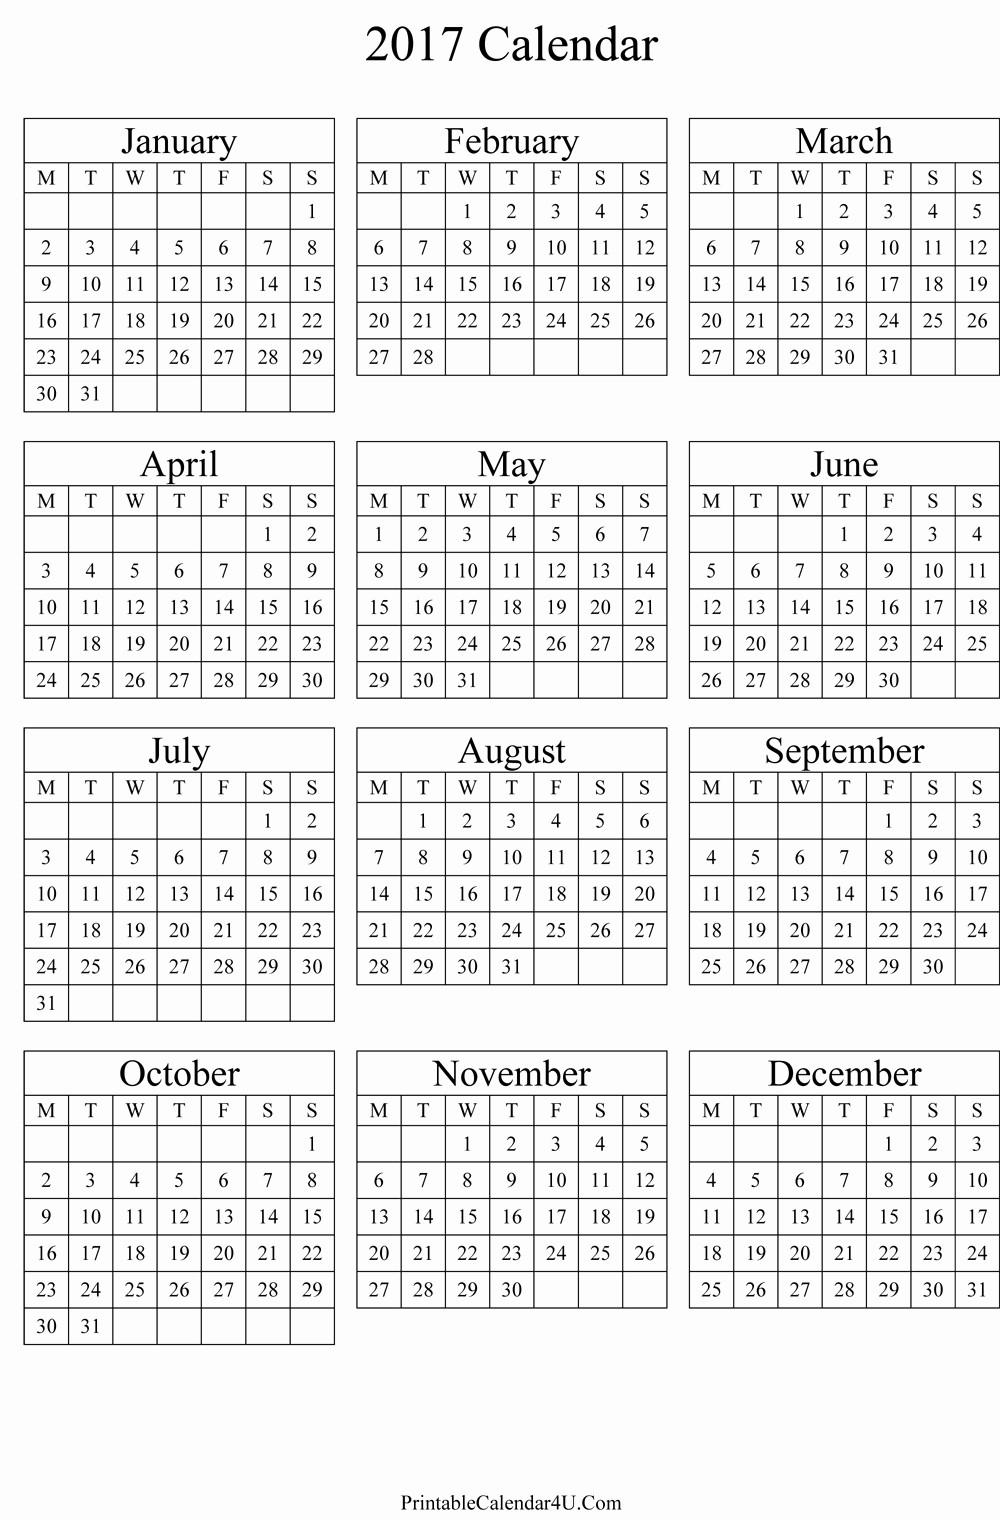 2017 Full Year Calendar Template Lovely Annual Calendar 2017 Portrait Printable Calendar 2019 2020